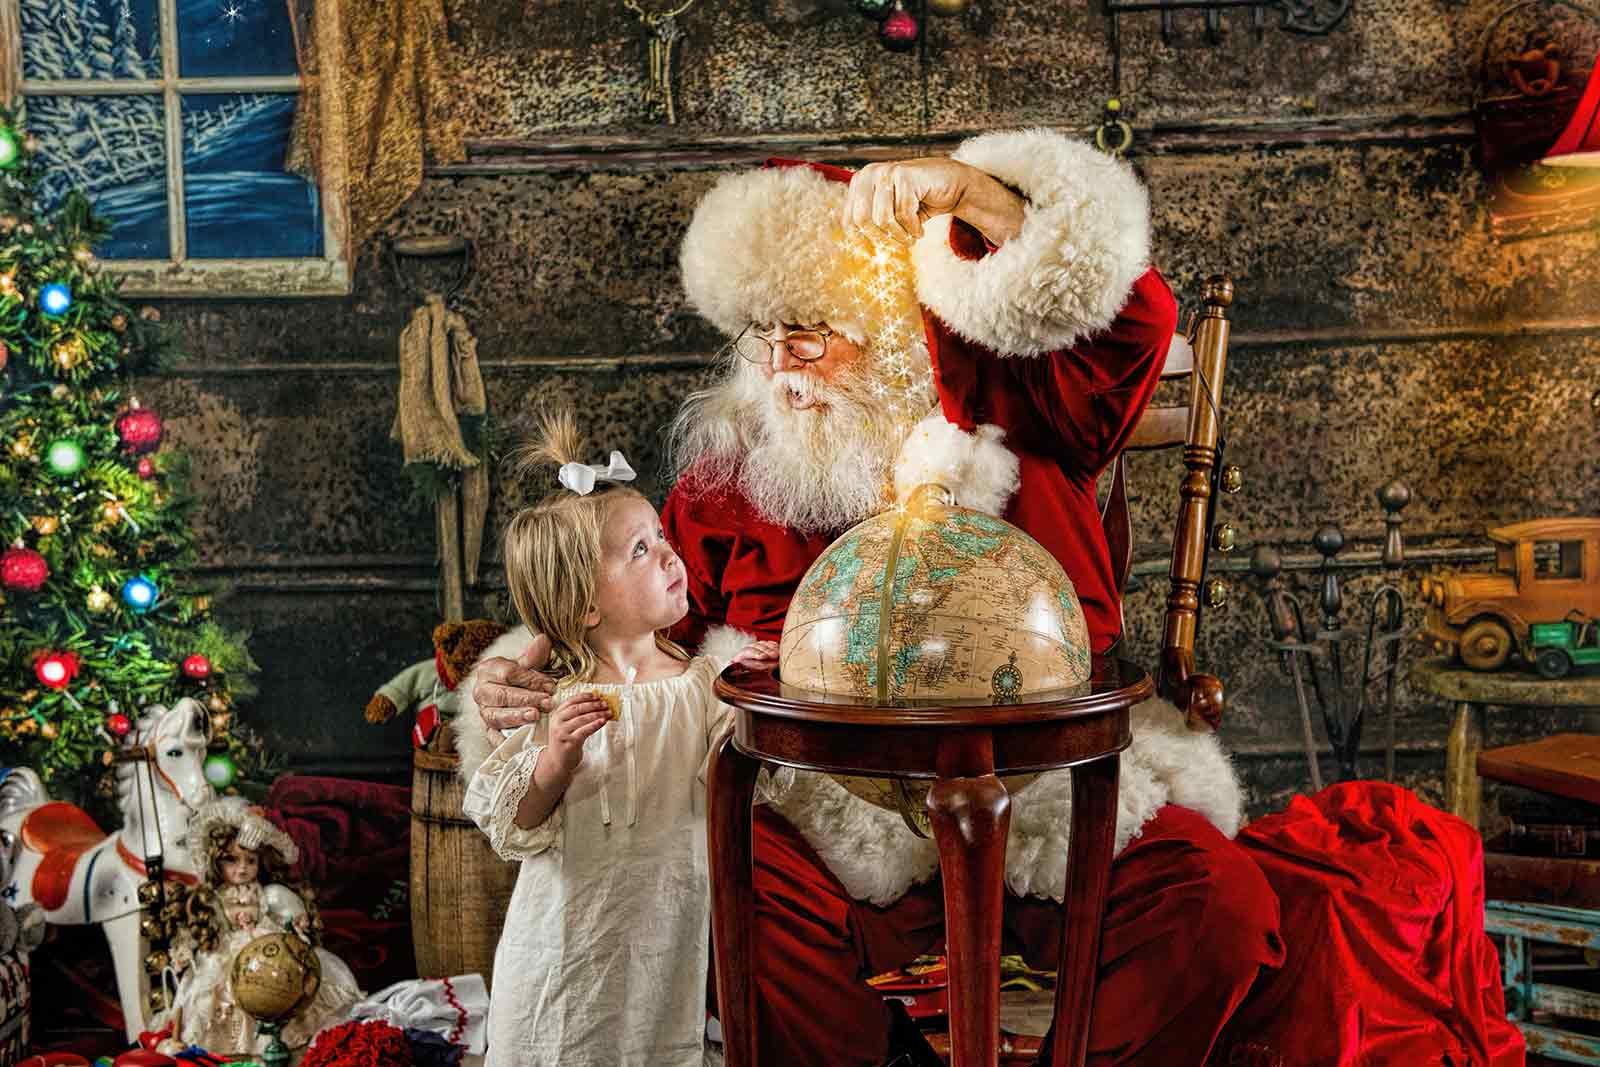 023_Magic-of-Santa-Anna-Thielen-Photography